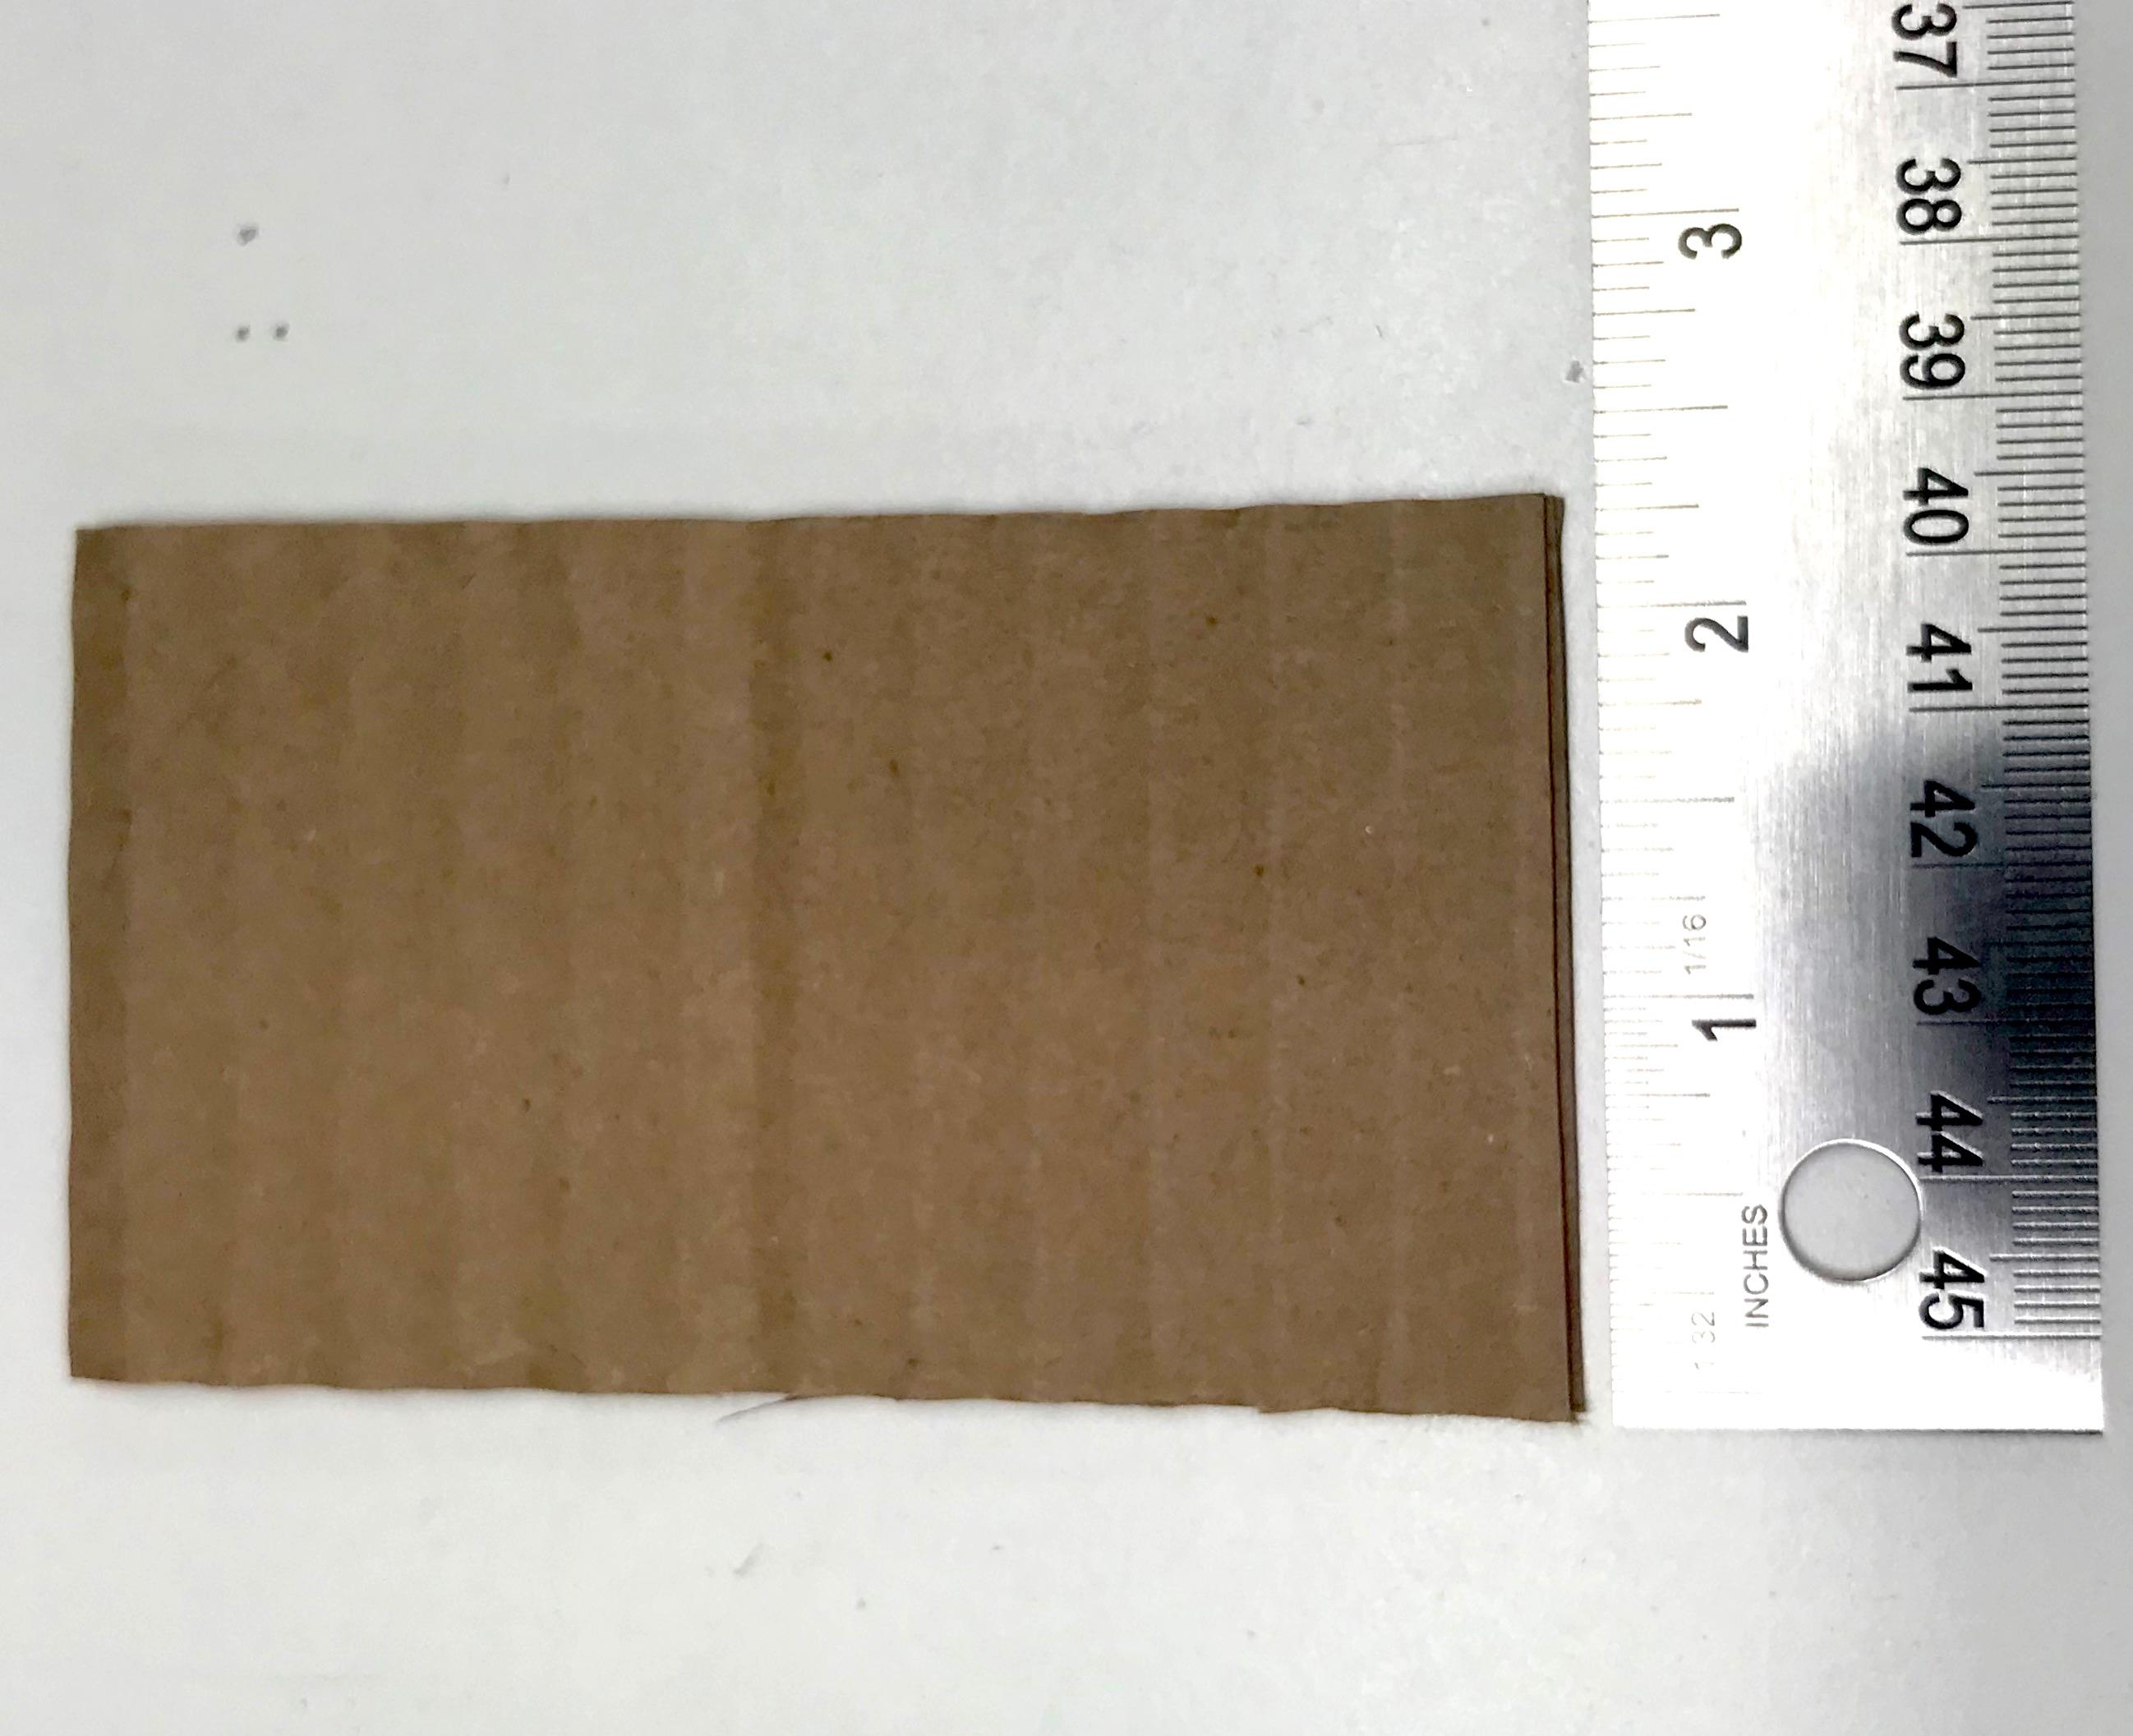 circuitpython_BVGJ6342.jpg